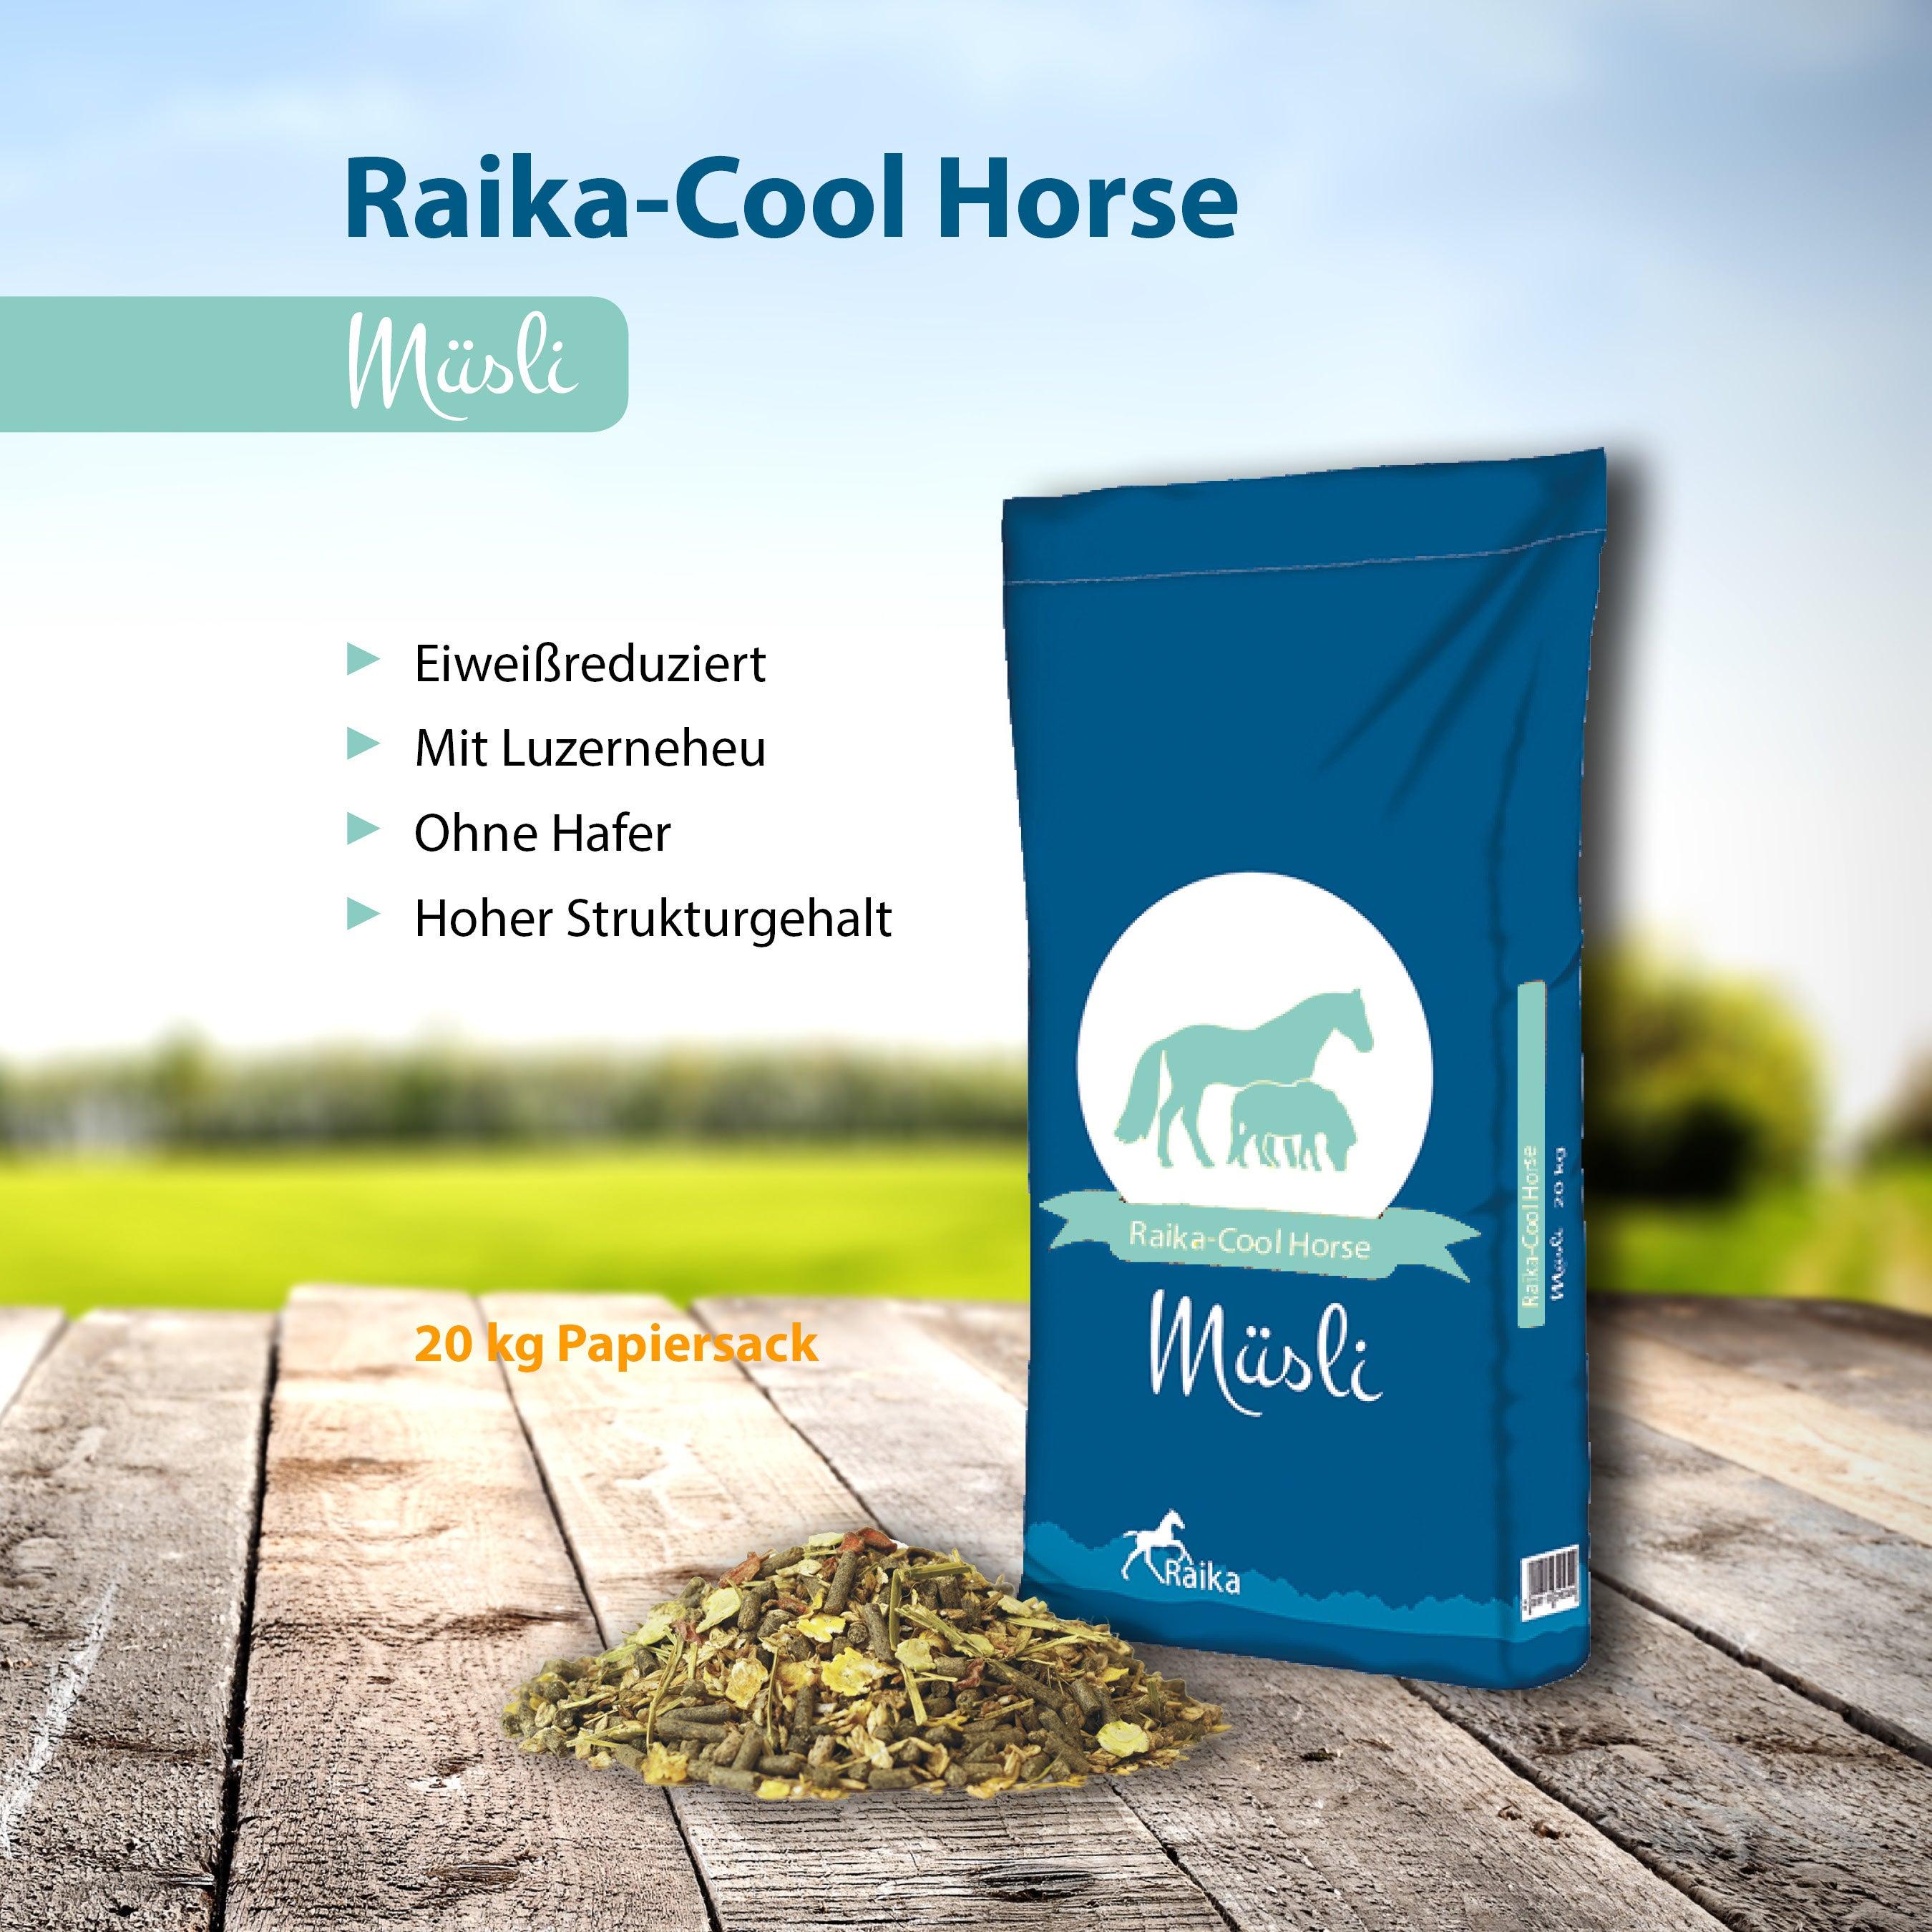 Raika-Cool Horse Müsli Pferdefutter